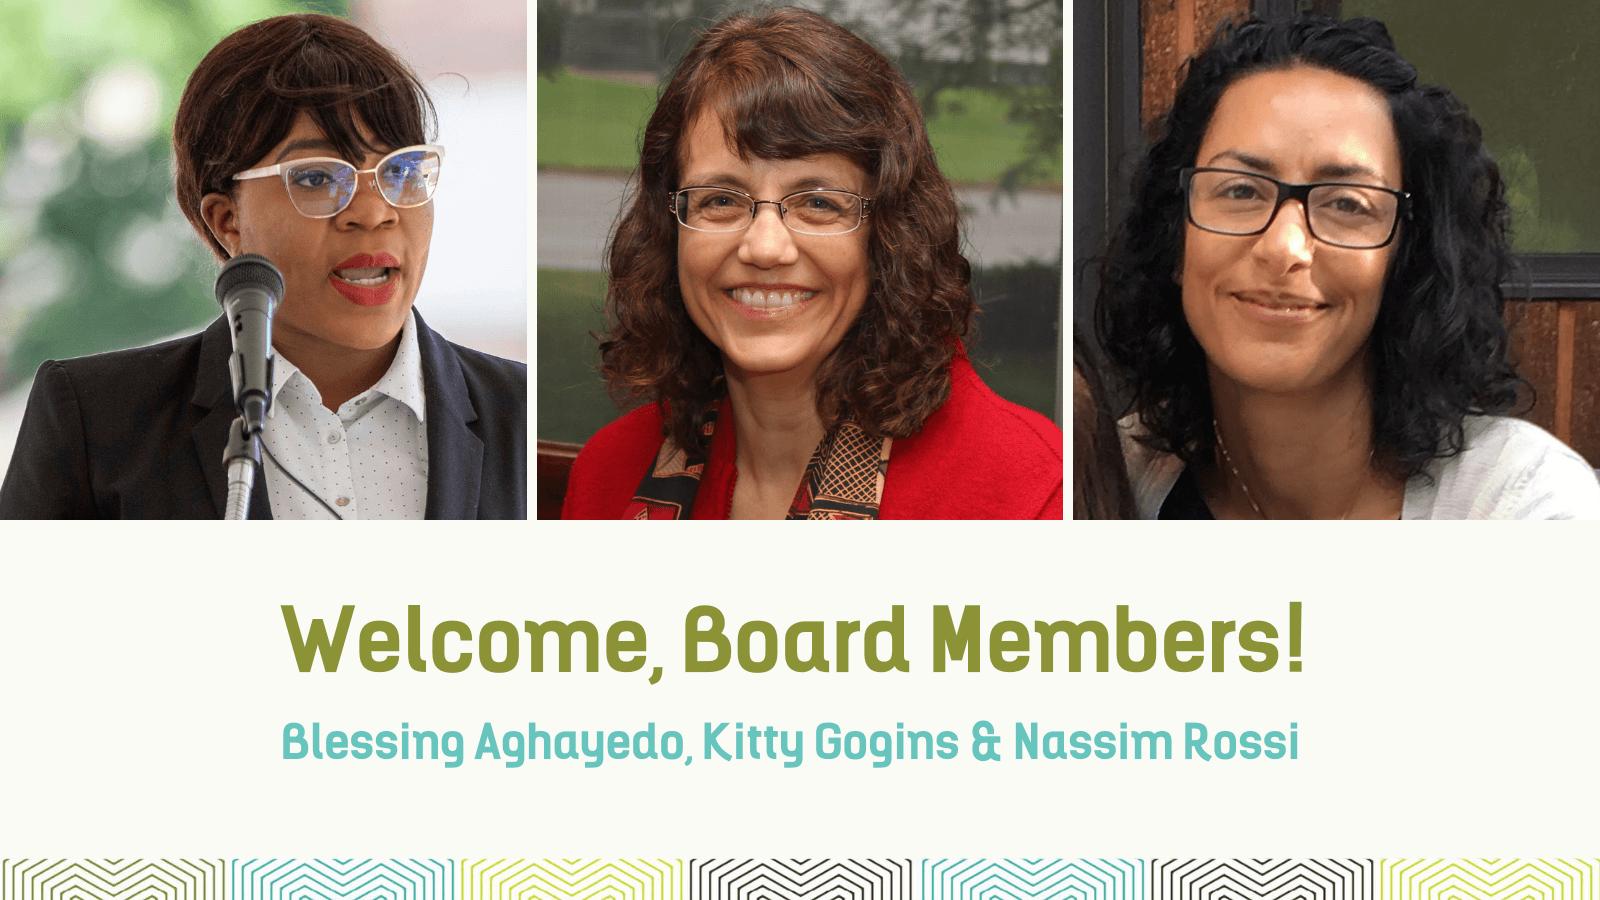 Welcome, board members!